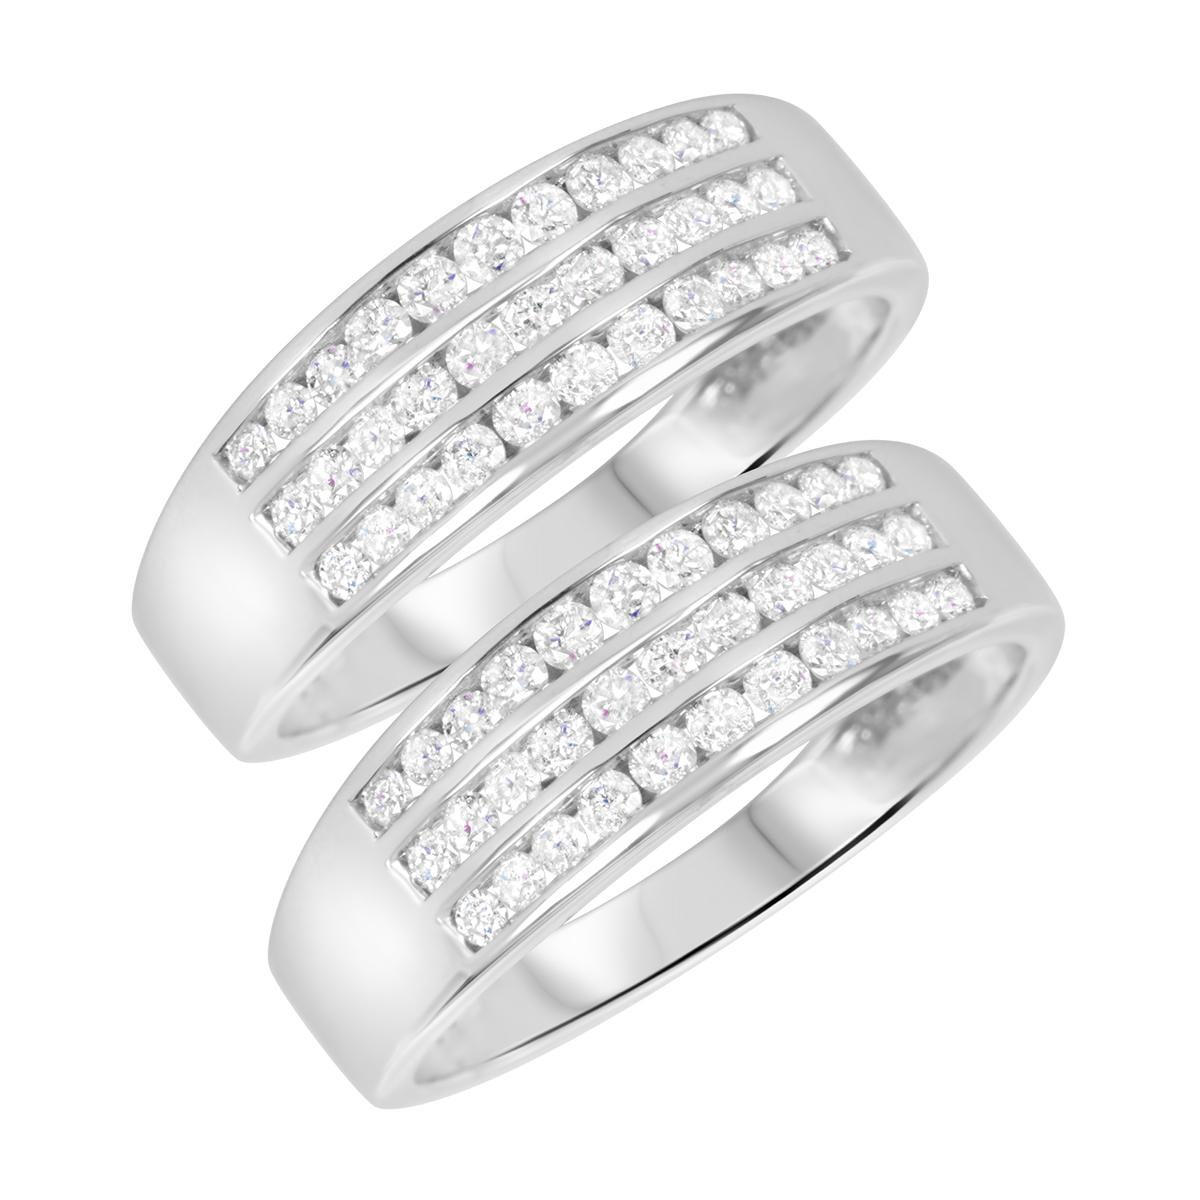 1 1/3 Carat T.W. Round Cut Mens  Same Sex Wedding Band Set 14K White Gold- Size